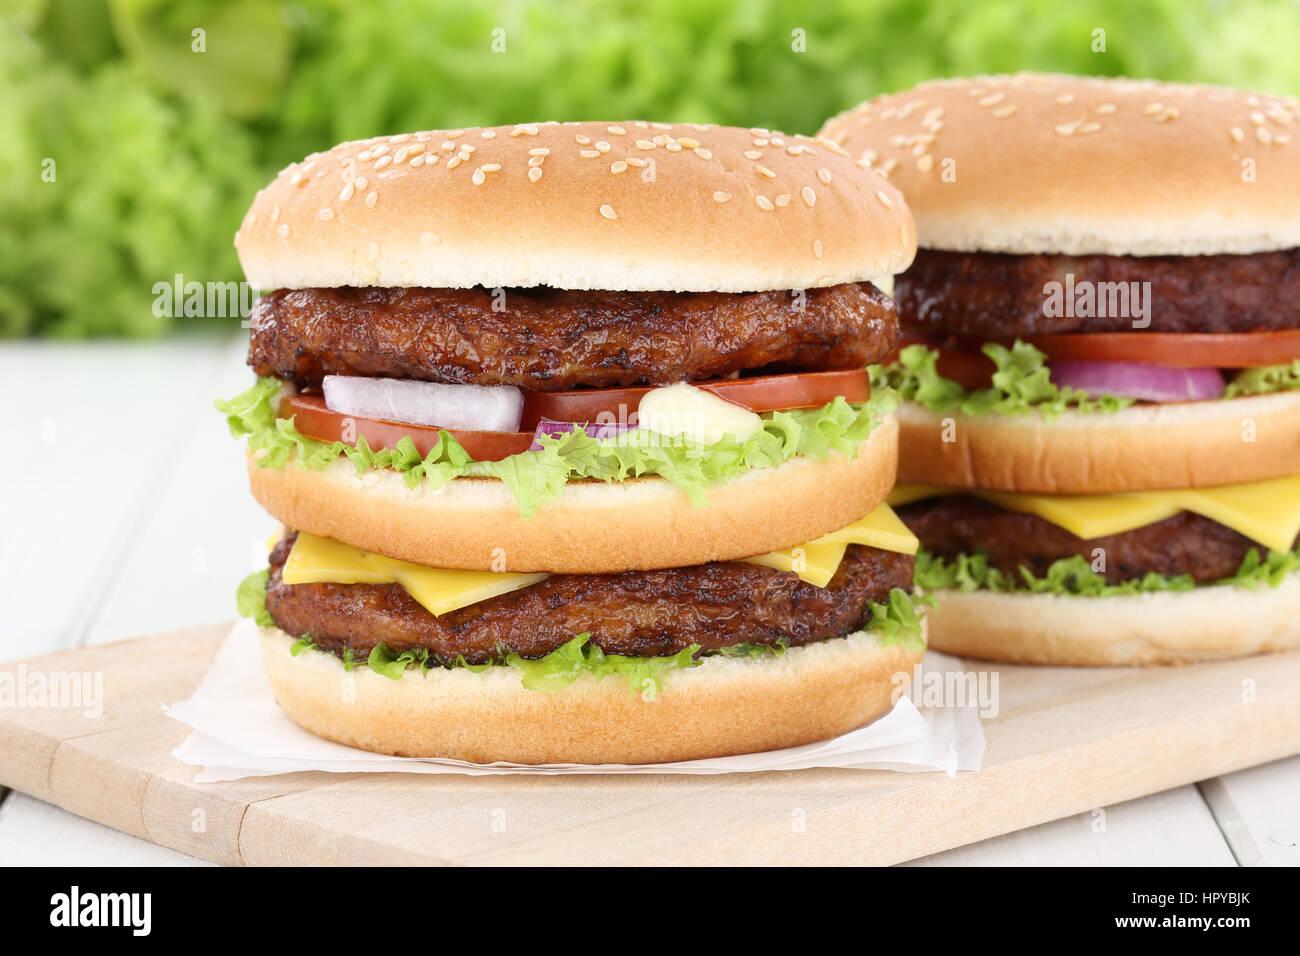 Double burger hamburger tomatoes cheese unhealthy eating - Stock Image